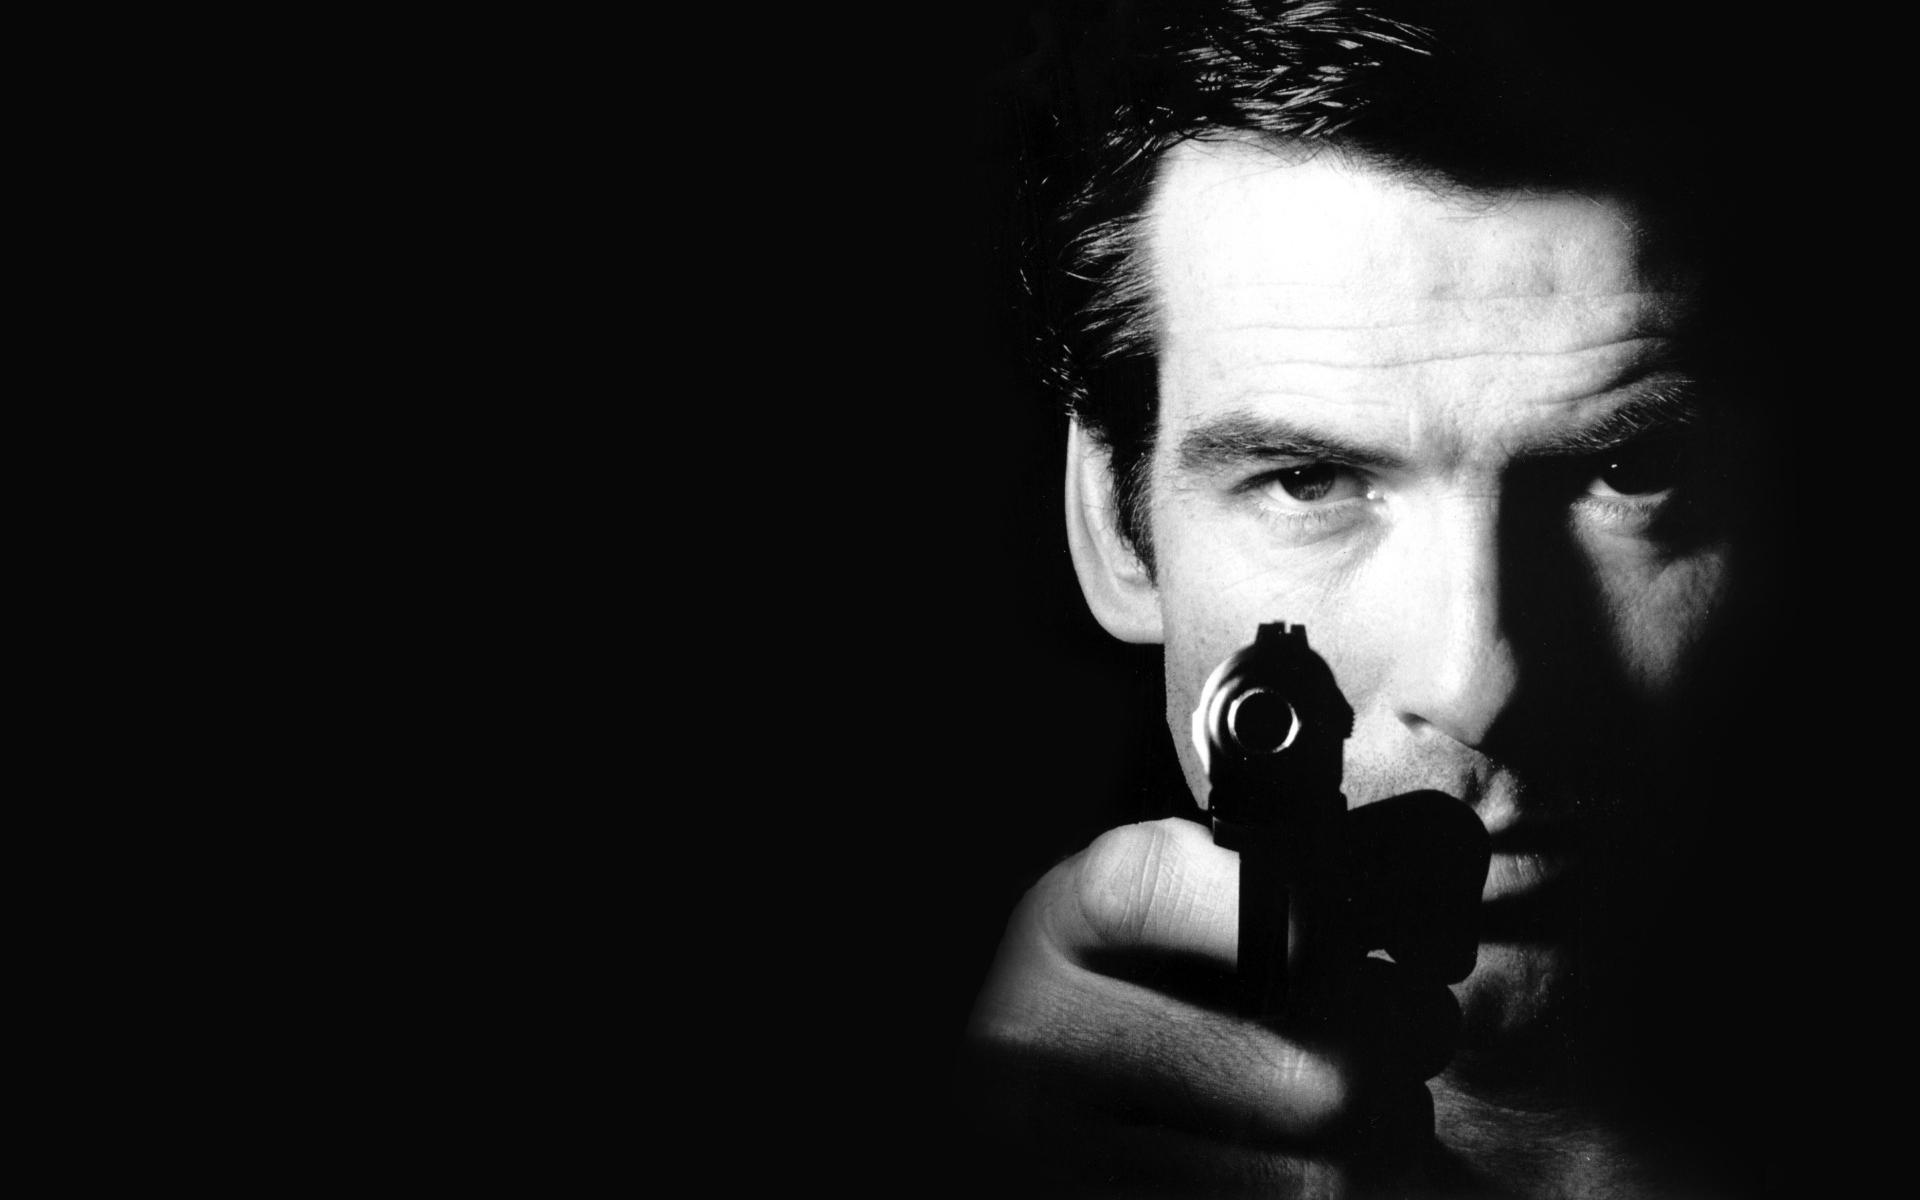 Brosnan pistol 007 James Bond weapons gunspeople men actor wallpaper 1920x1200